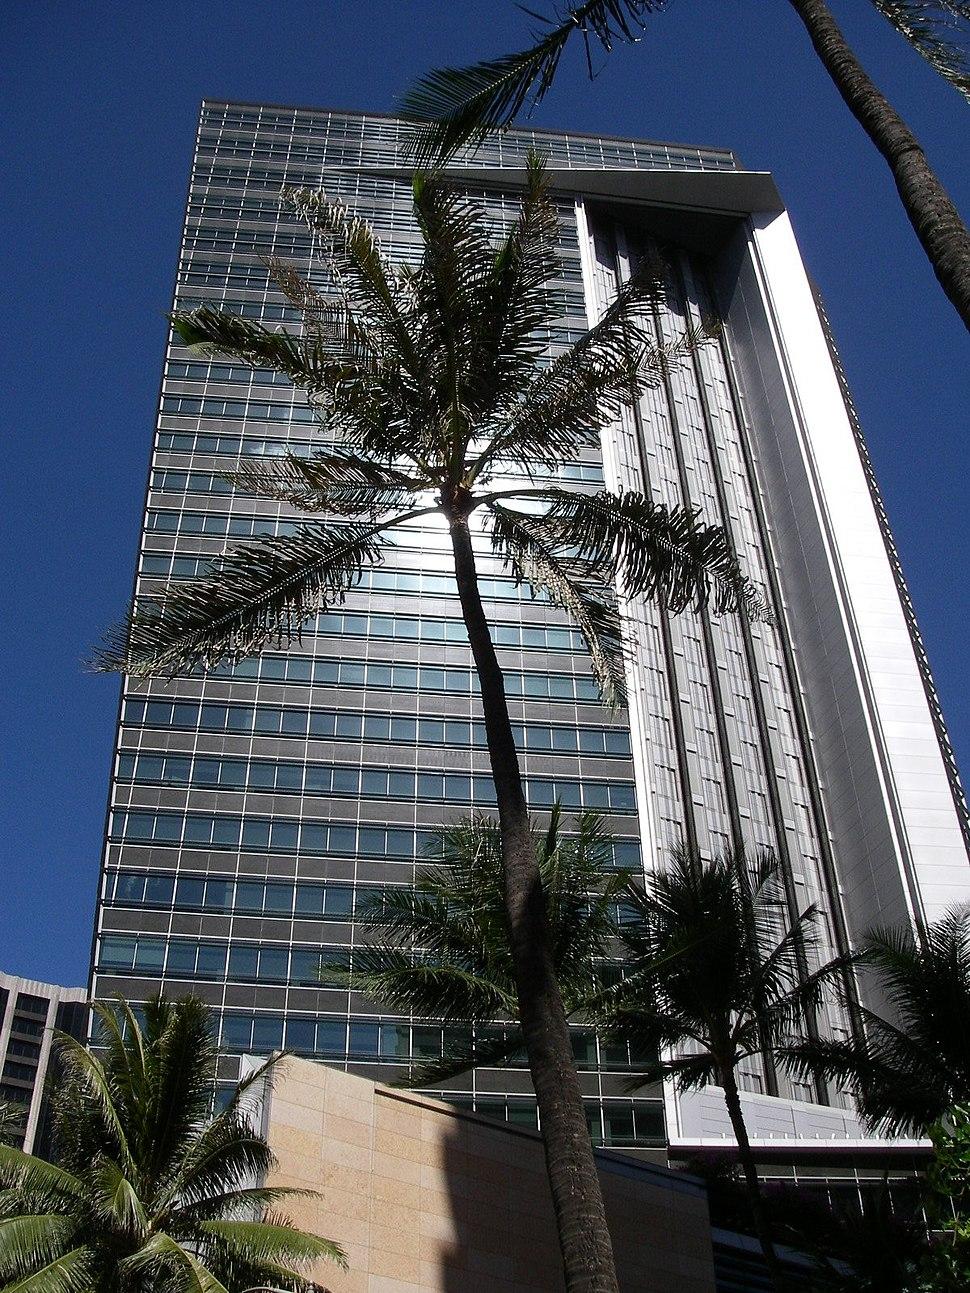 First Hawaiian Center Tower in Honolulu, Hawaii USA